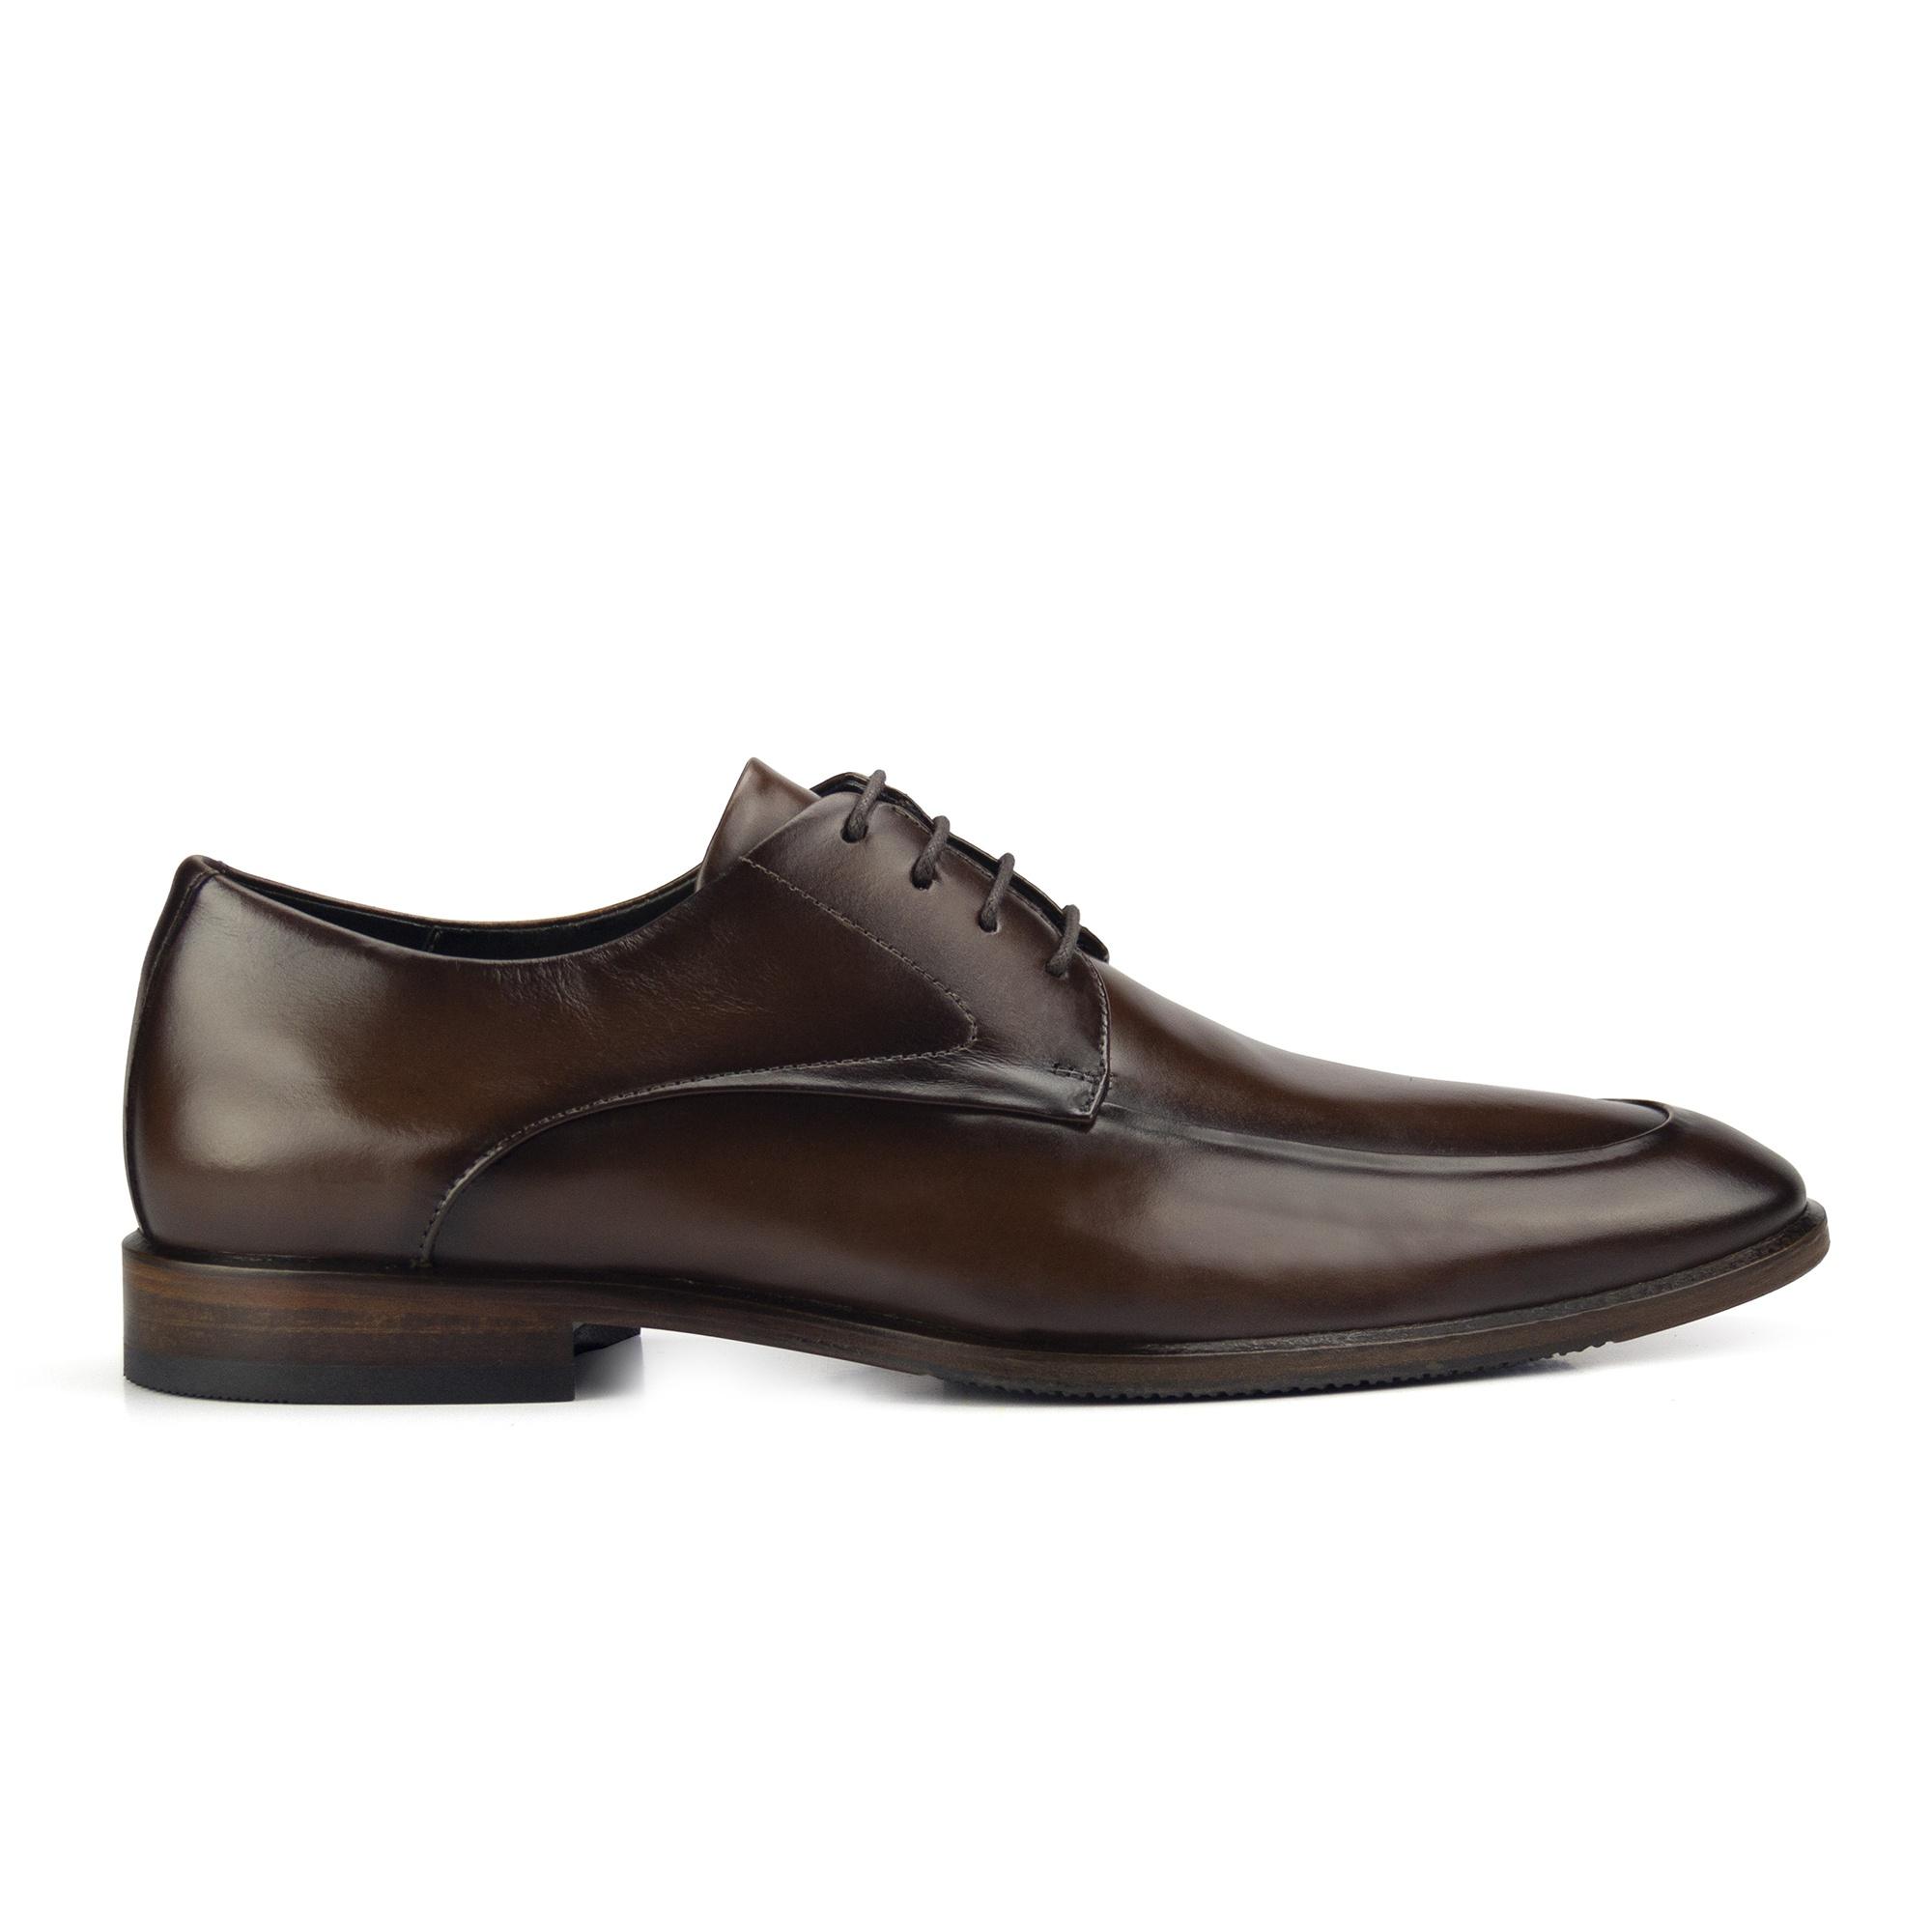 Sapato Derby Masculino Marrom Monbran Dressy